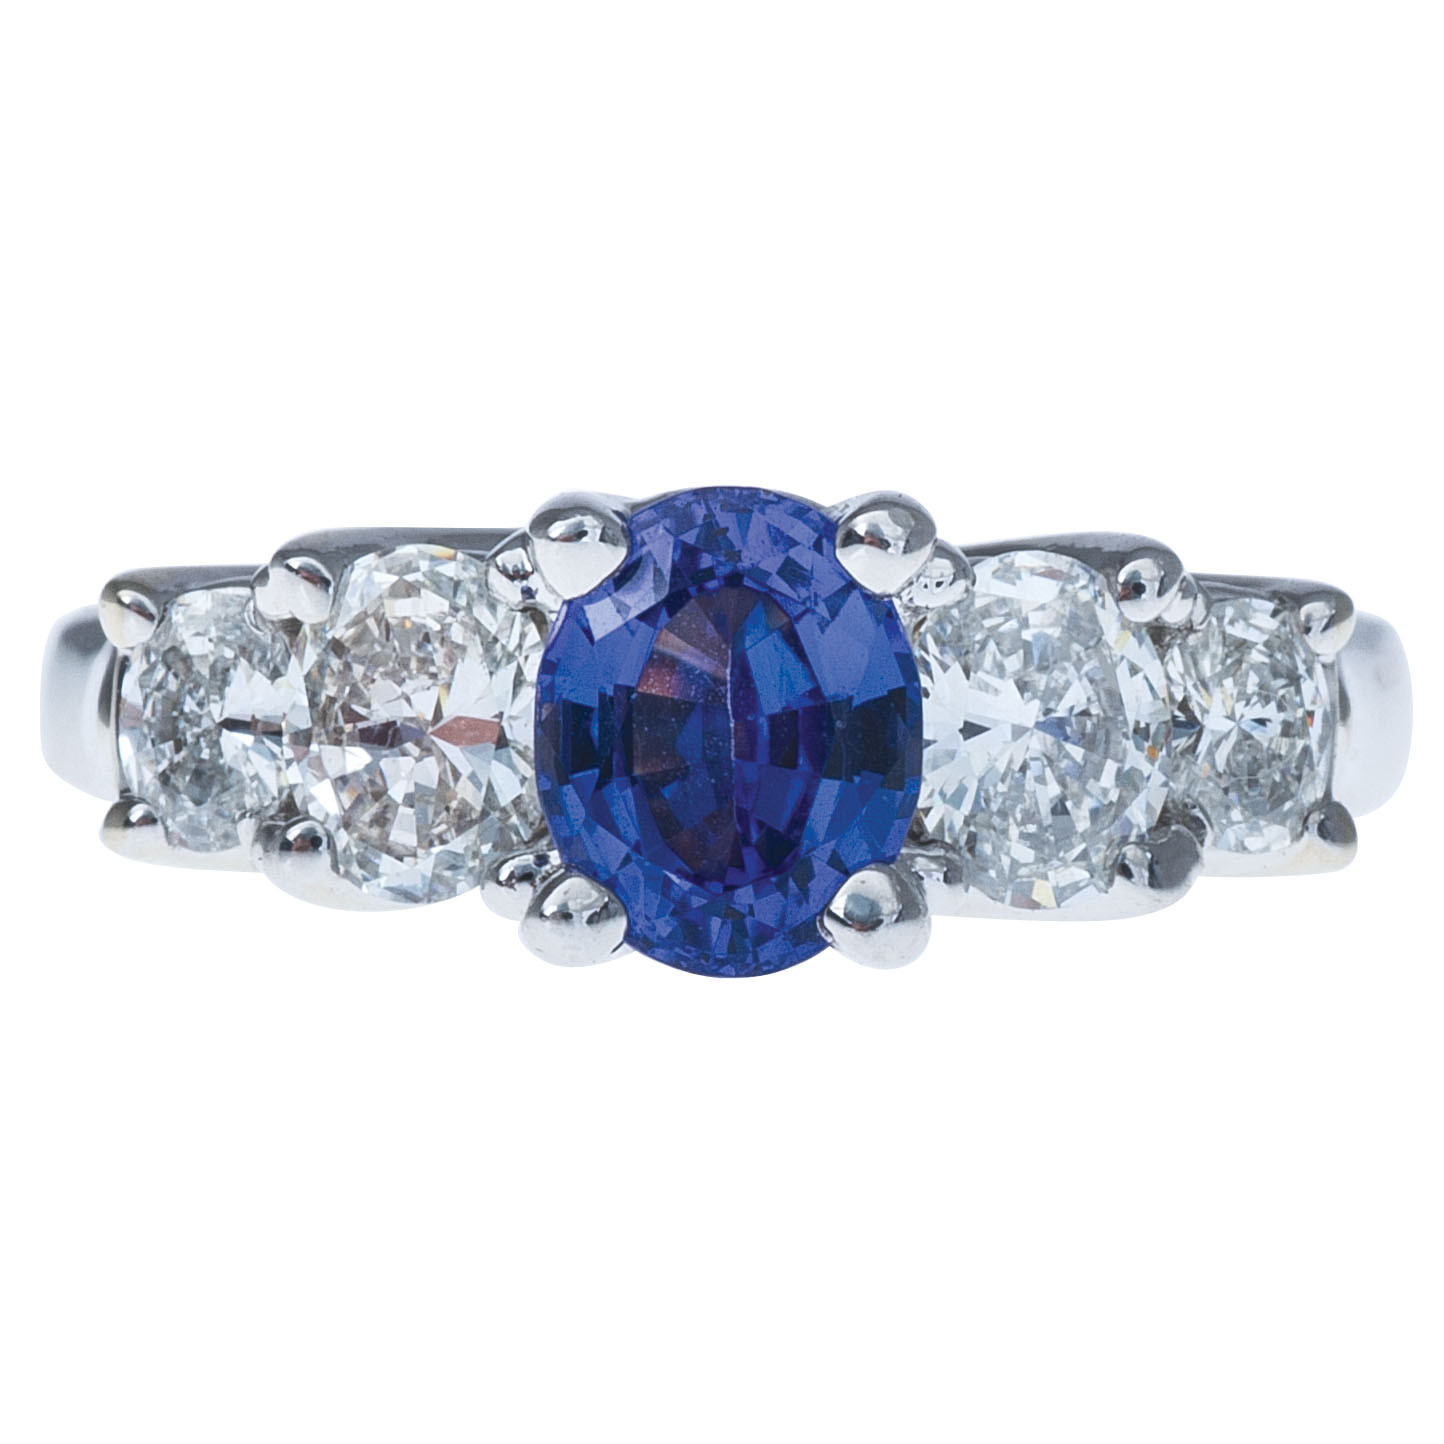 Vintage 0.95 CT Tanzanite & Diamond Ring